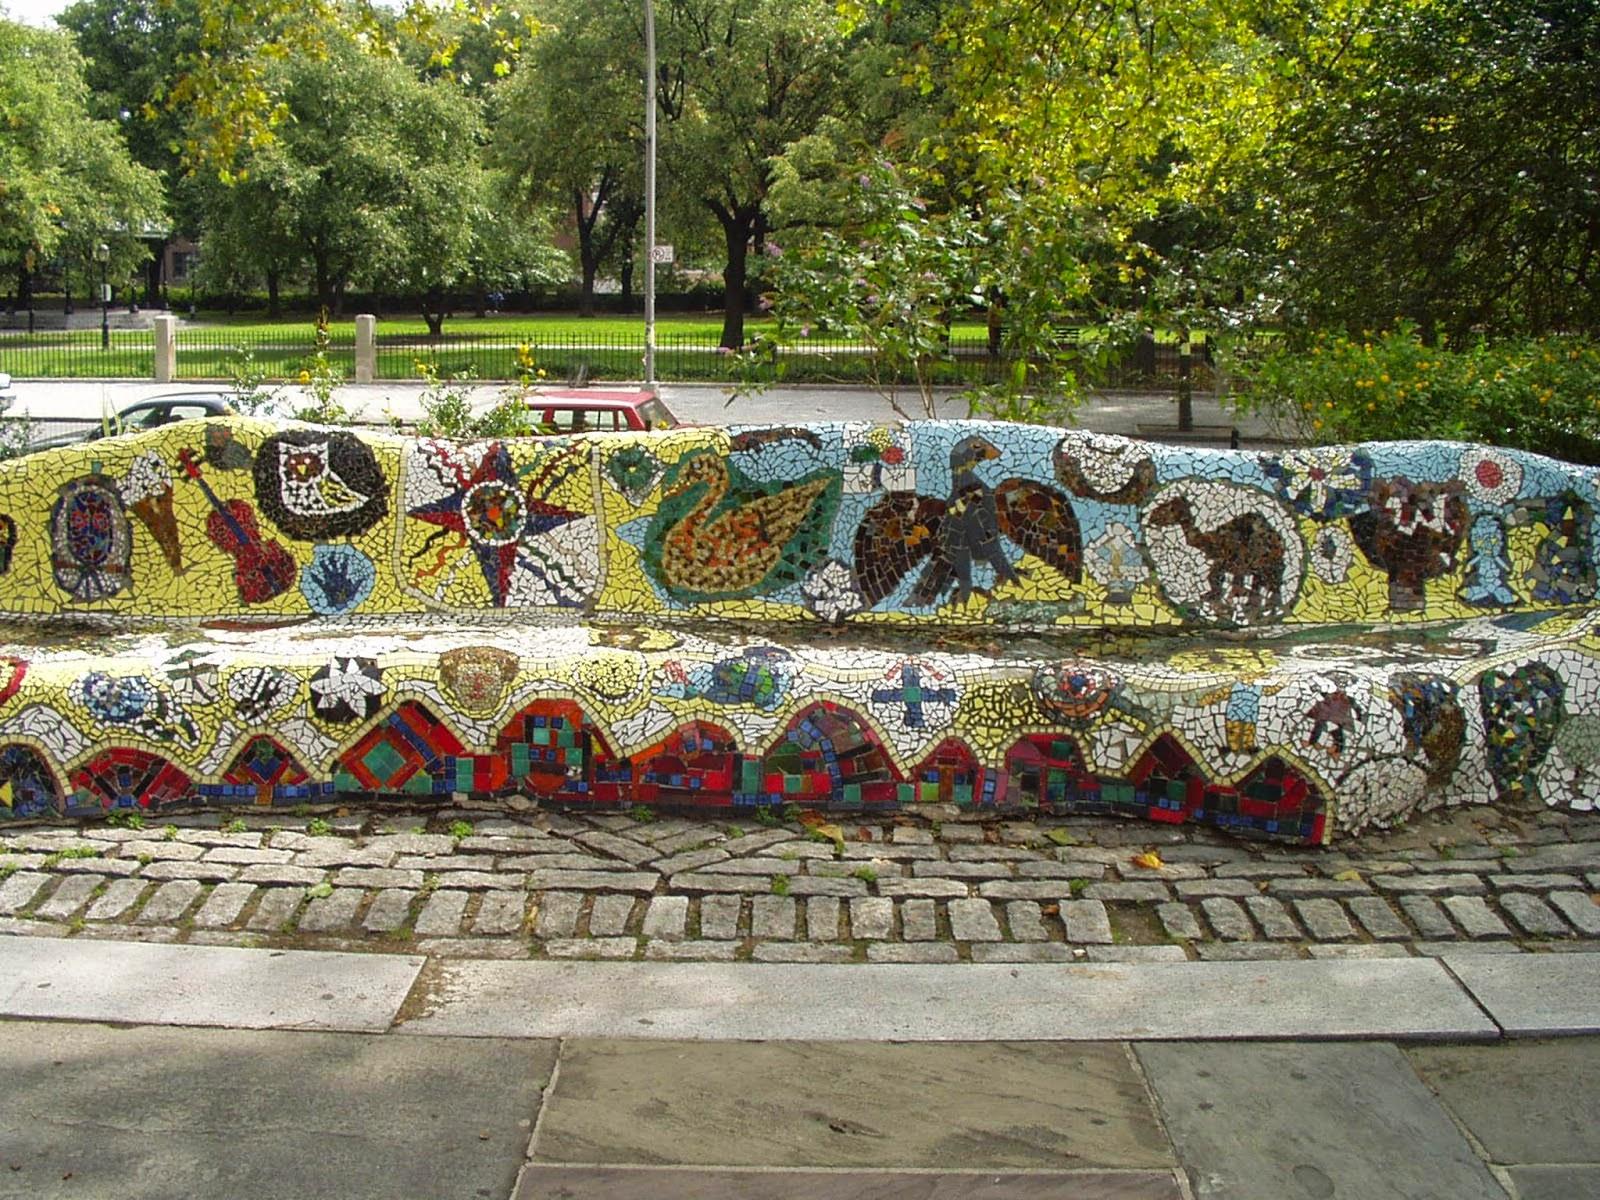 Gaudi in new york a broken tile mosaic masterpiece in riverside gaudi in new york a broken tile mosaic masterpiece in riverside park dailygadgetfo Gallery